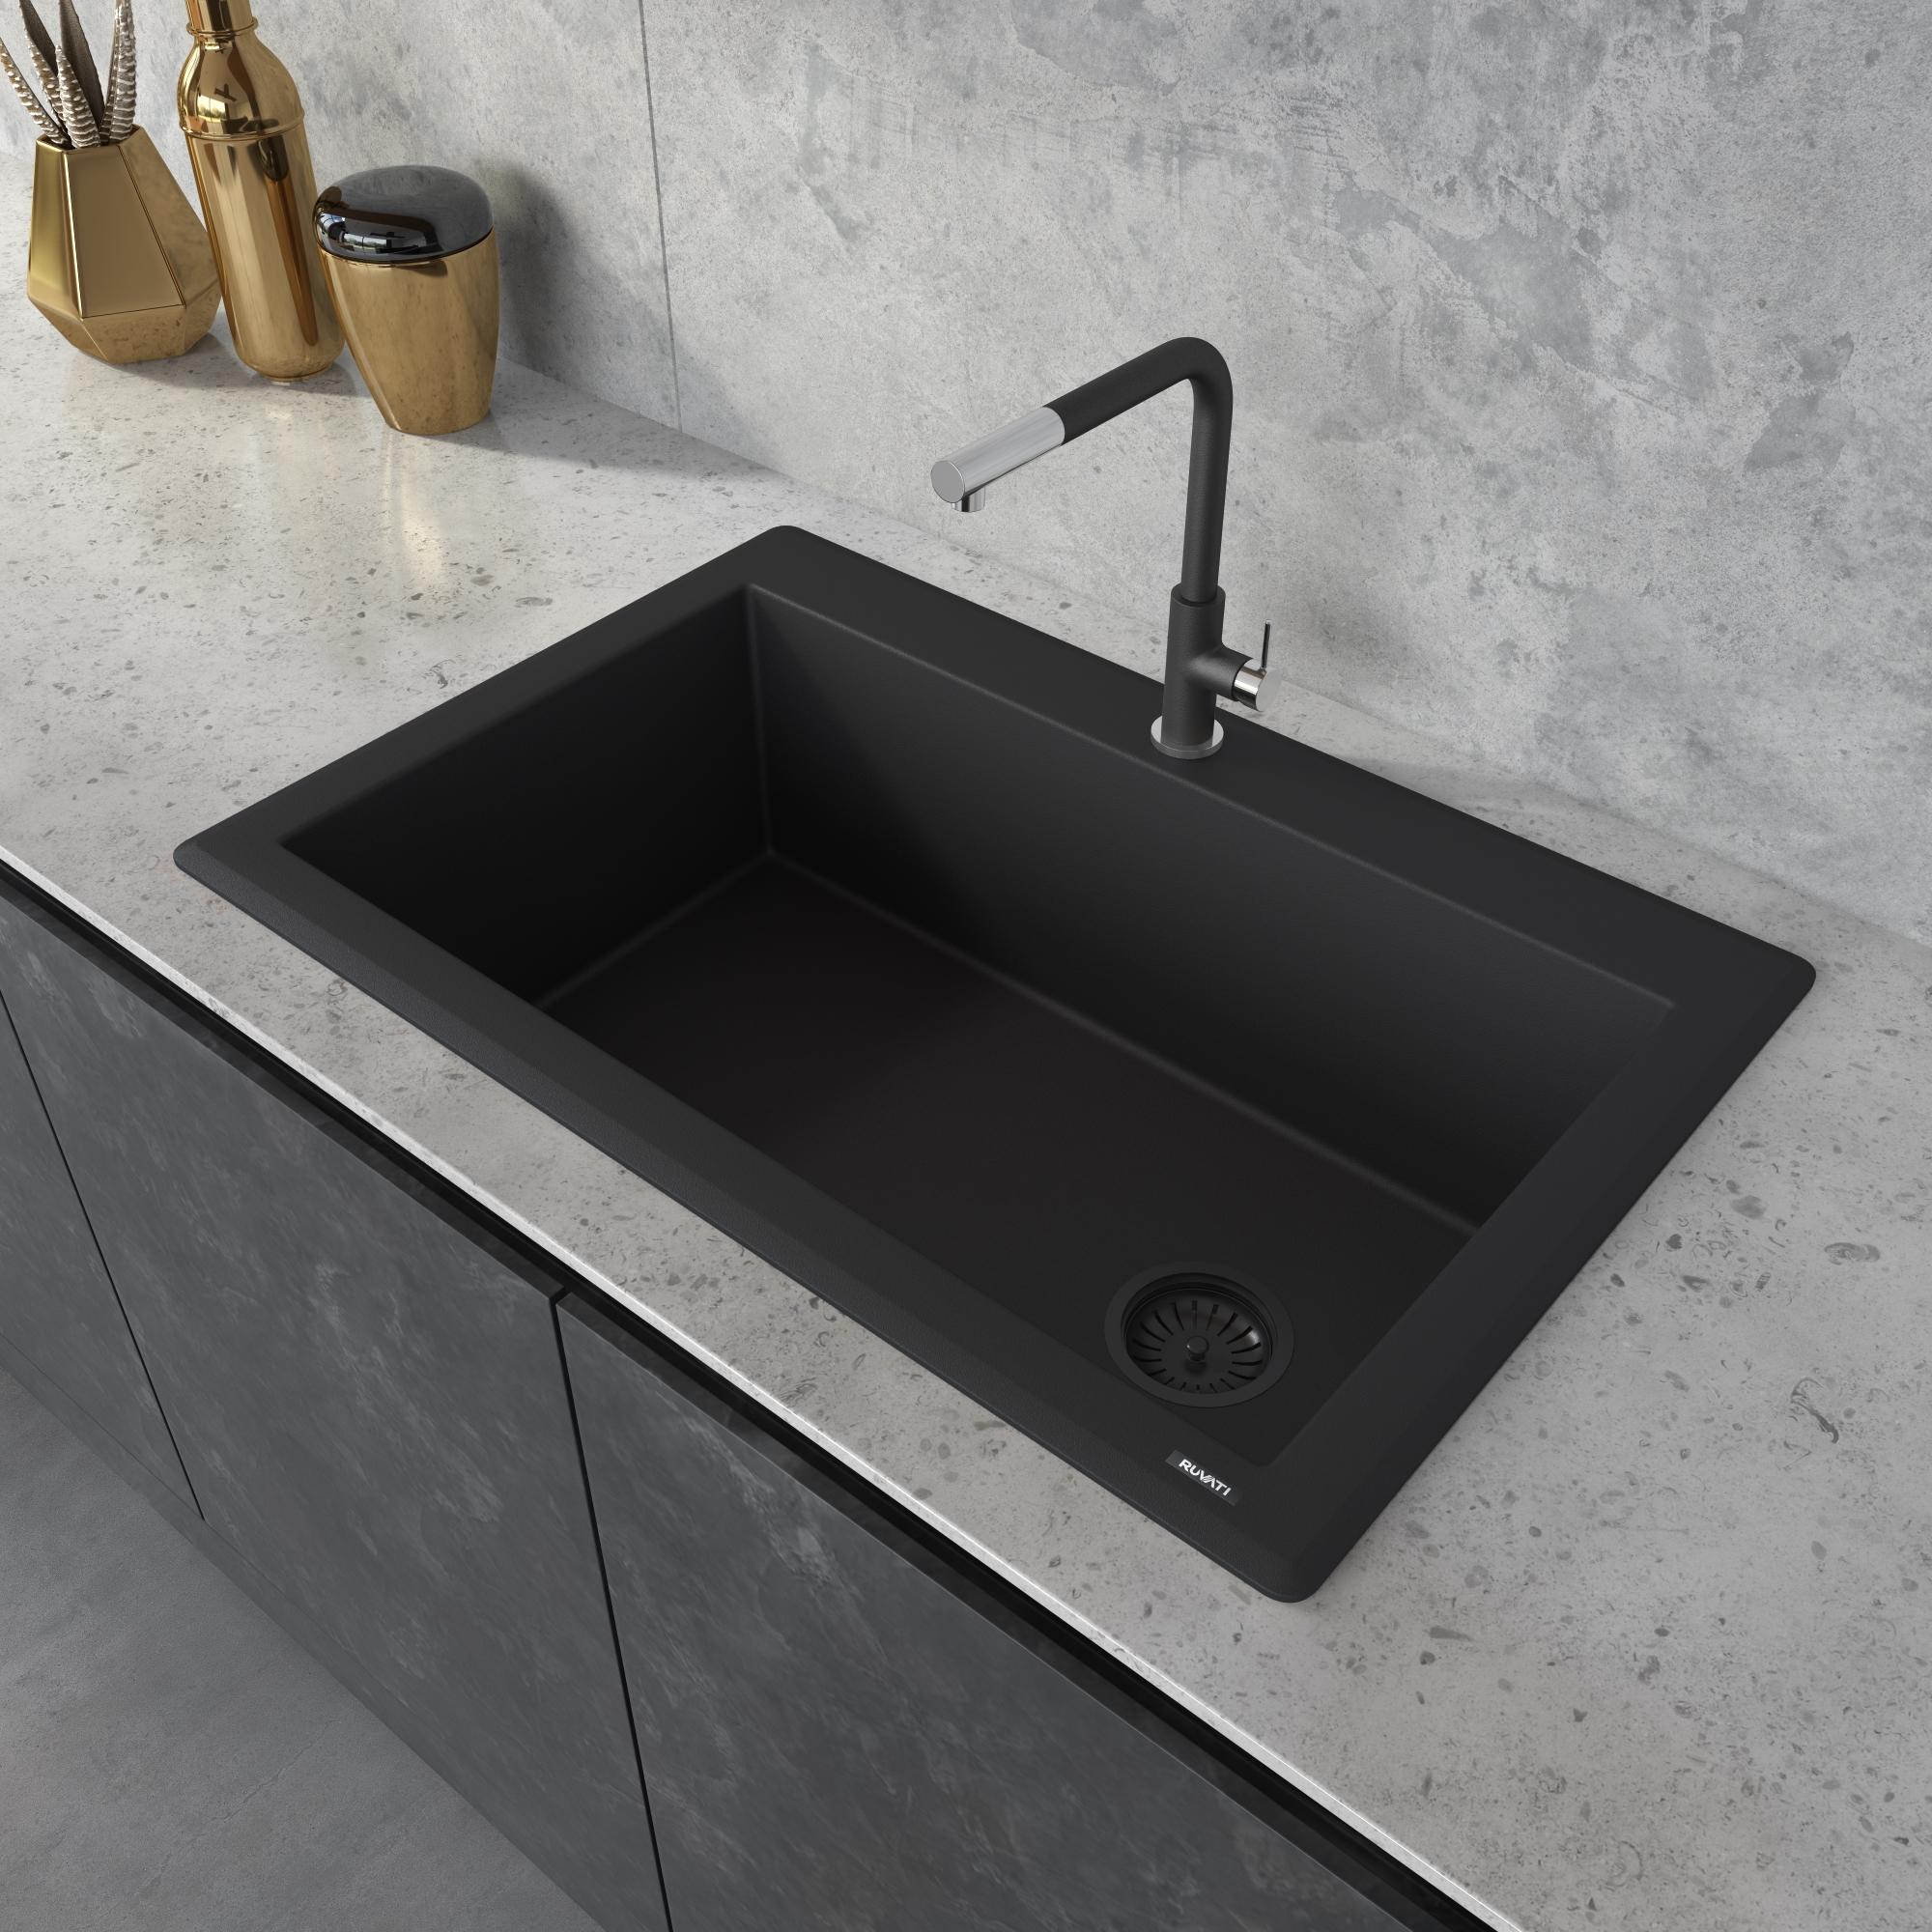 Ruvati 33 X 22 Inch Epigranite Drop In Topmount Granite Composite Single Bowl Kitchen Sink Black Galaxy Rvg1033gx Ruvati Usa